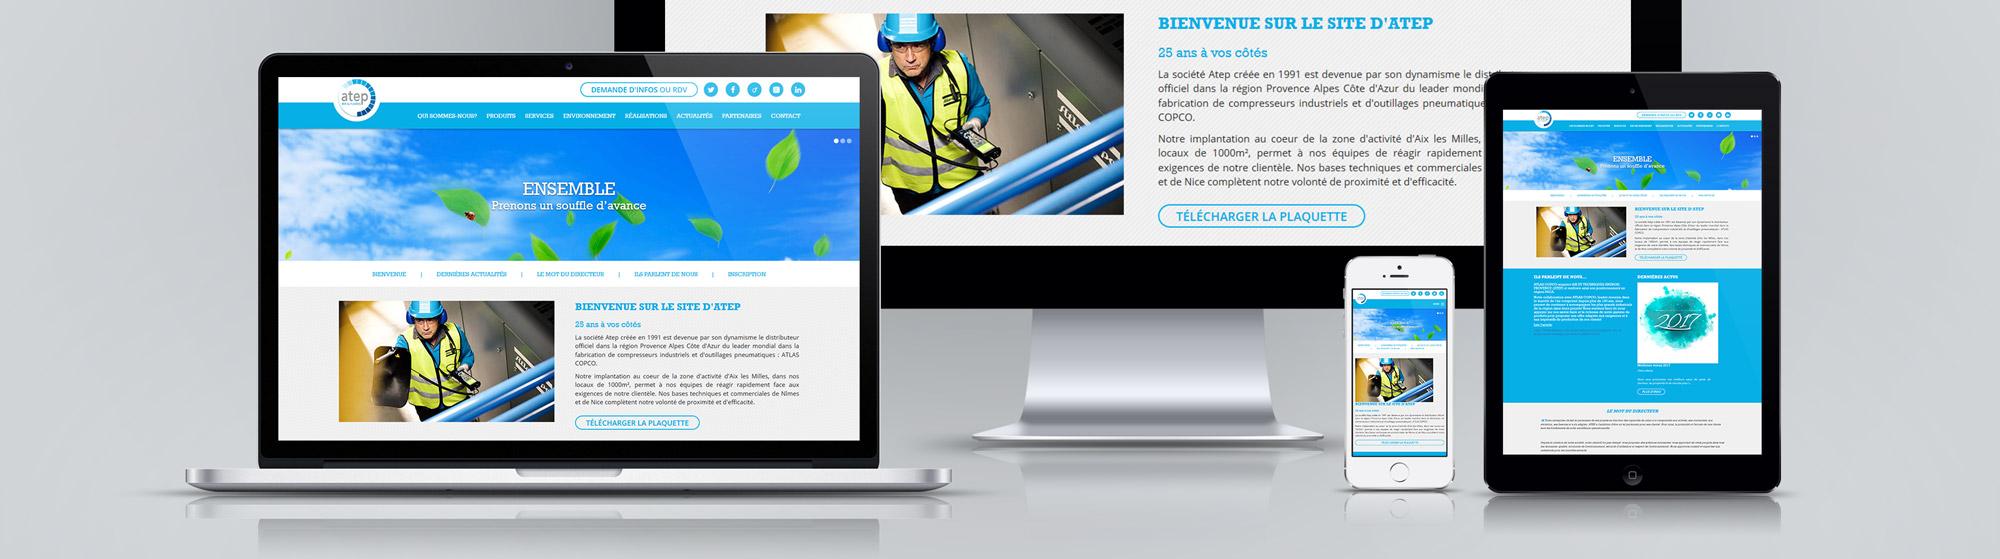 webdesigner freelance aix-en-provence